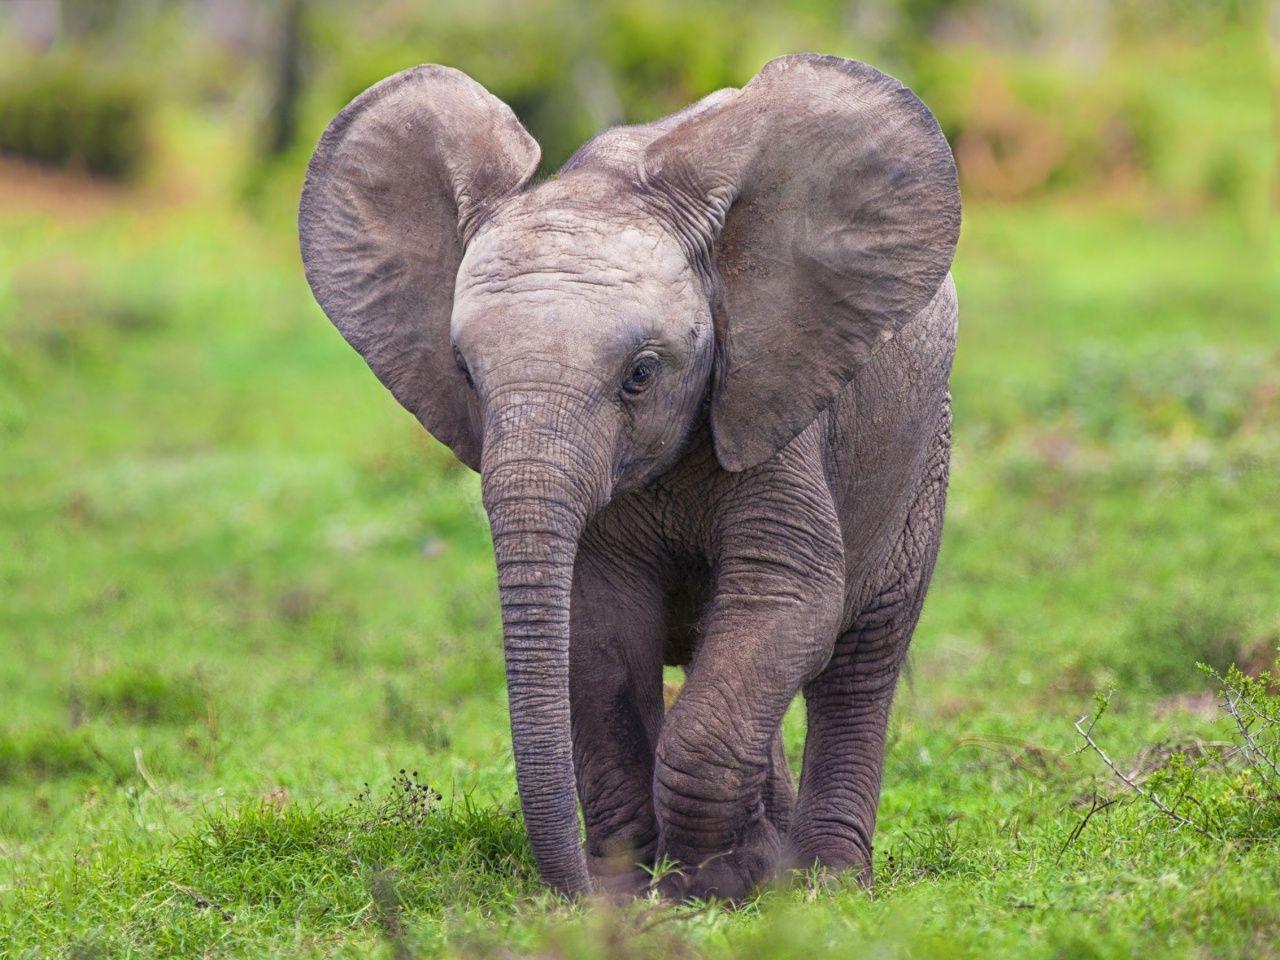 baby elephant wallpaper http://vicvapor/baby-elephant